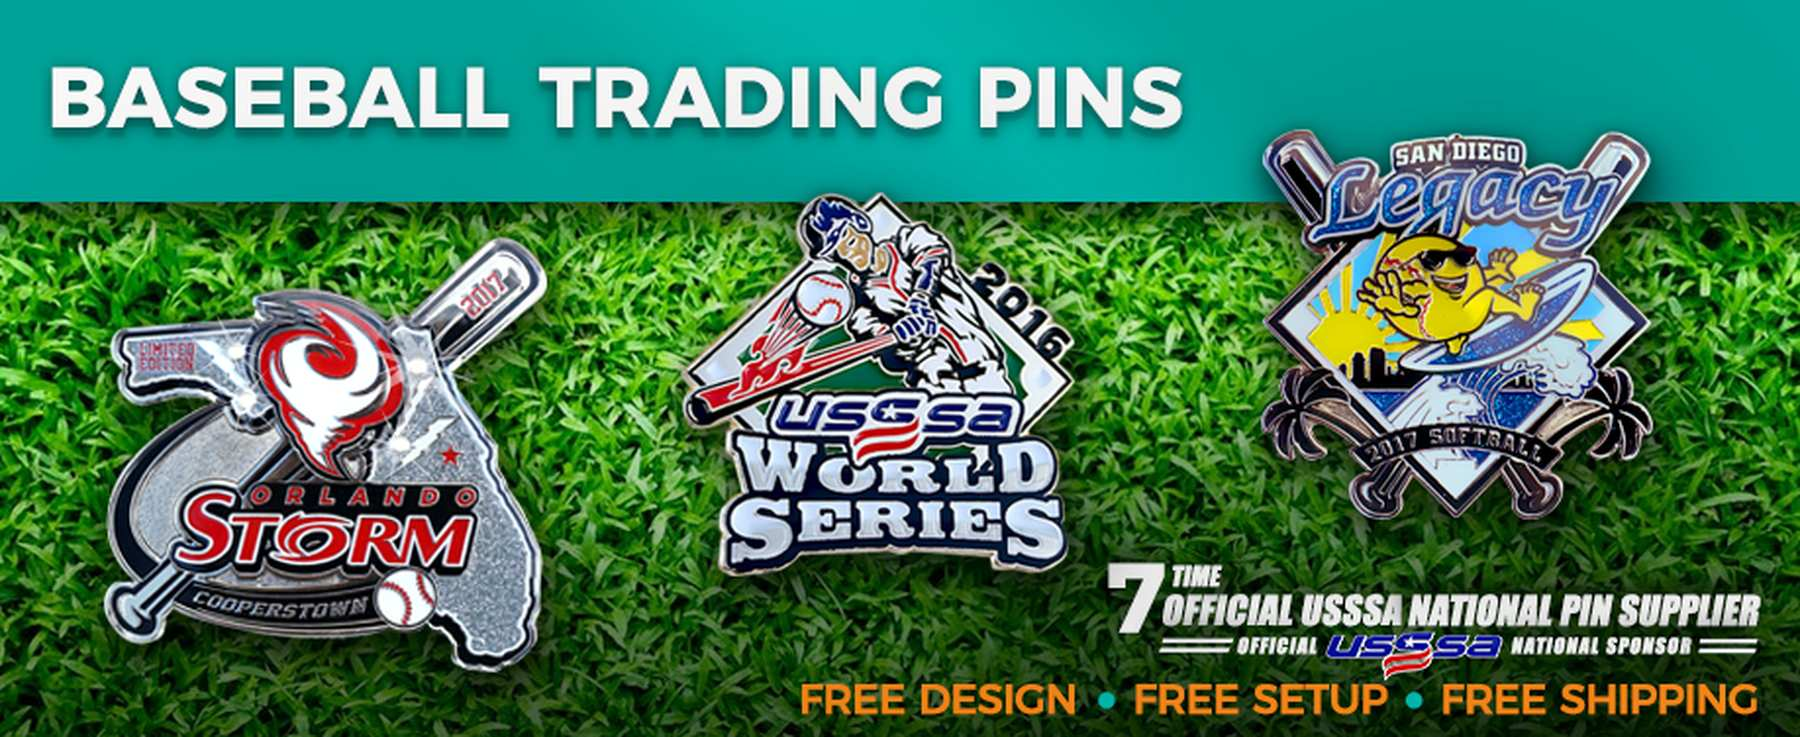 Custom USSSA Trading Pins